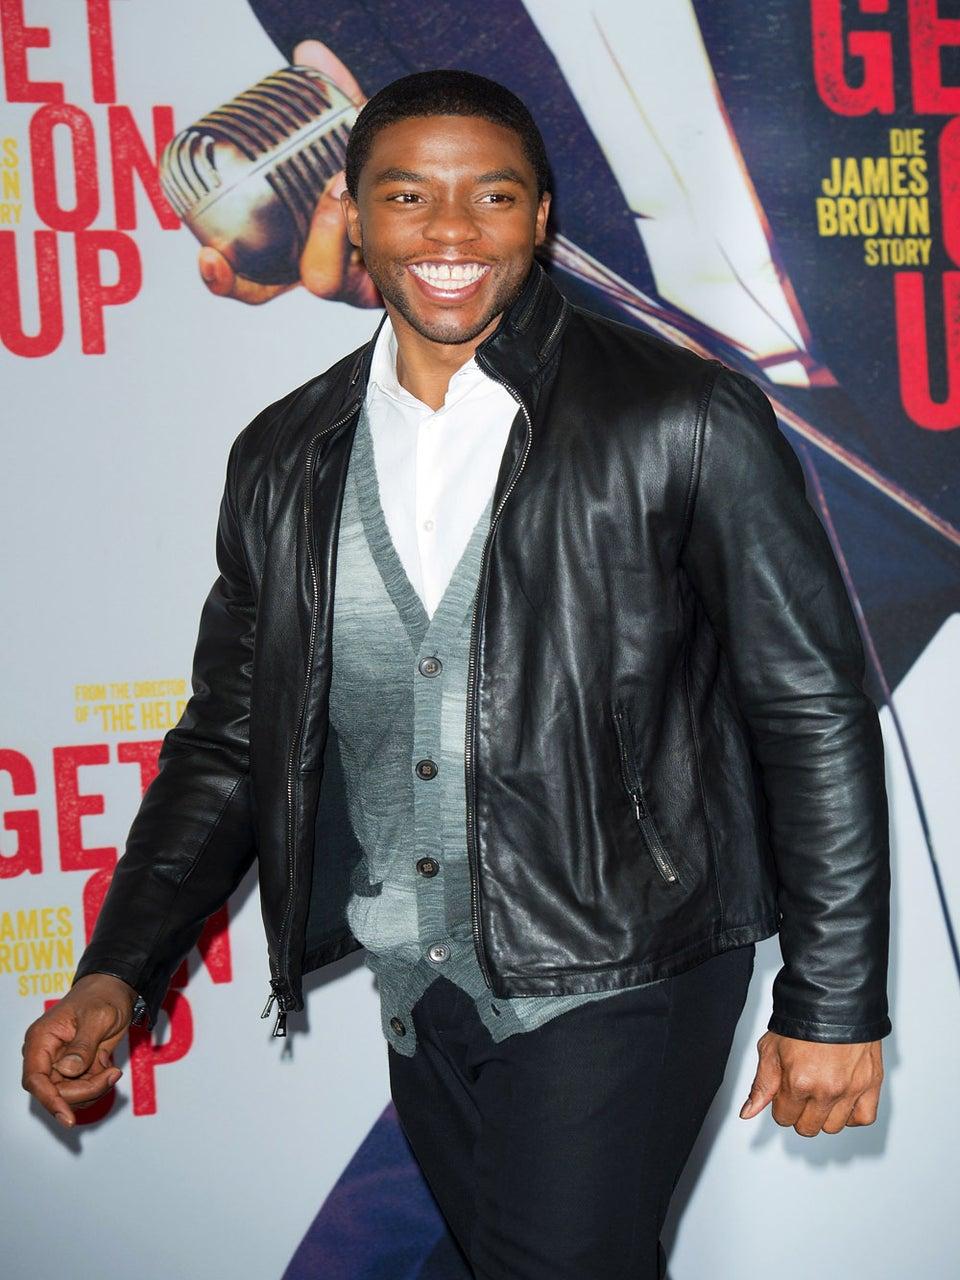 Chadwick Boseman to Star as Marvel's First Black Superhero